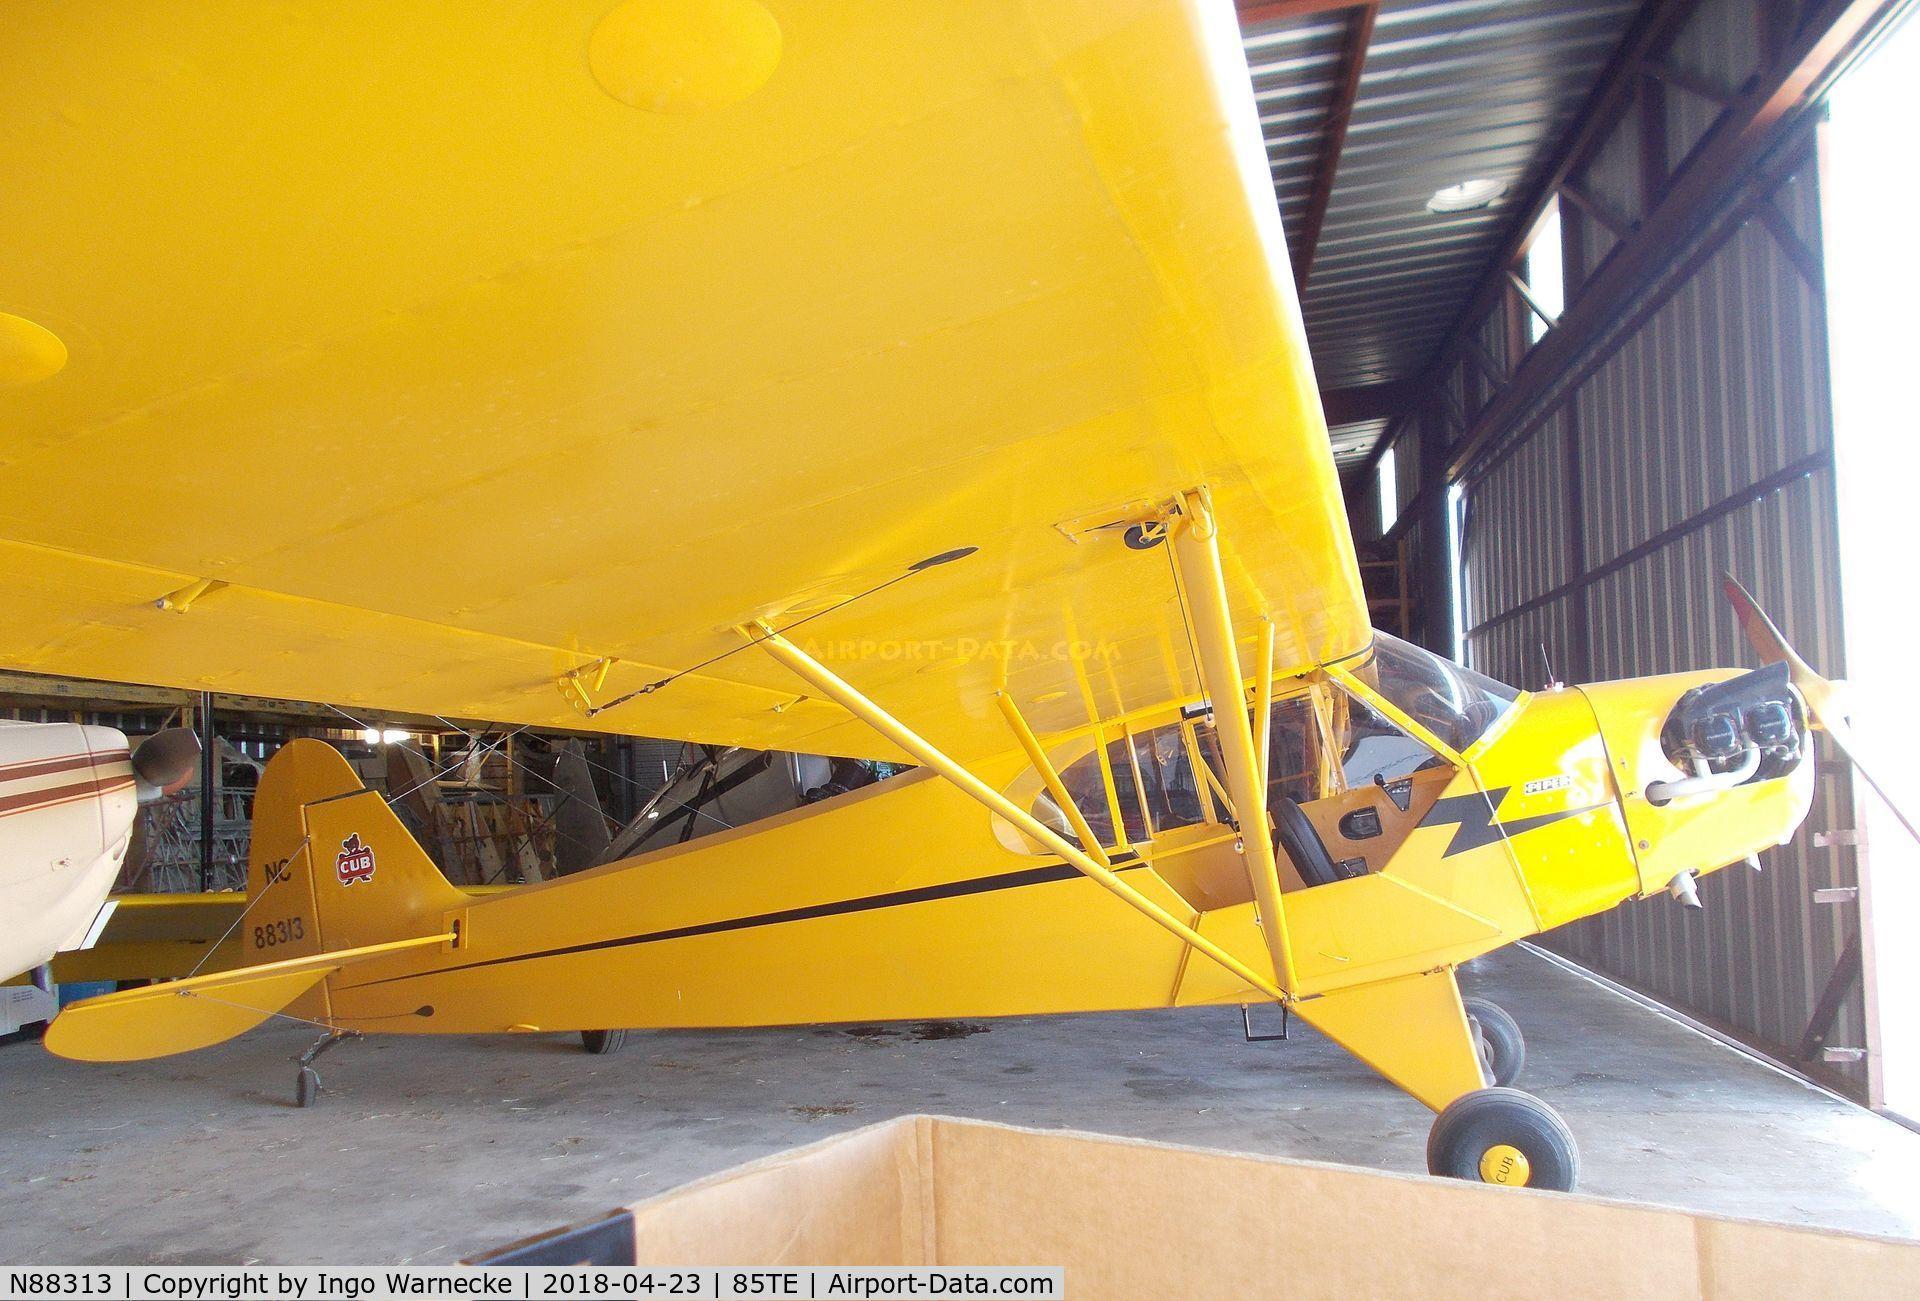 N88313, Piper J3C-65 Cub C/N 15931, Piper J3C-65 Cub at the Pioneer Flight Museum, Kingsbury TX